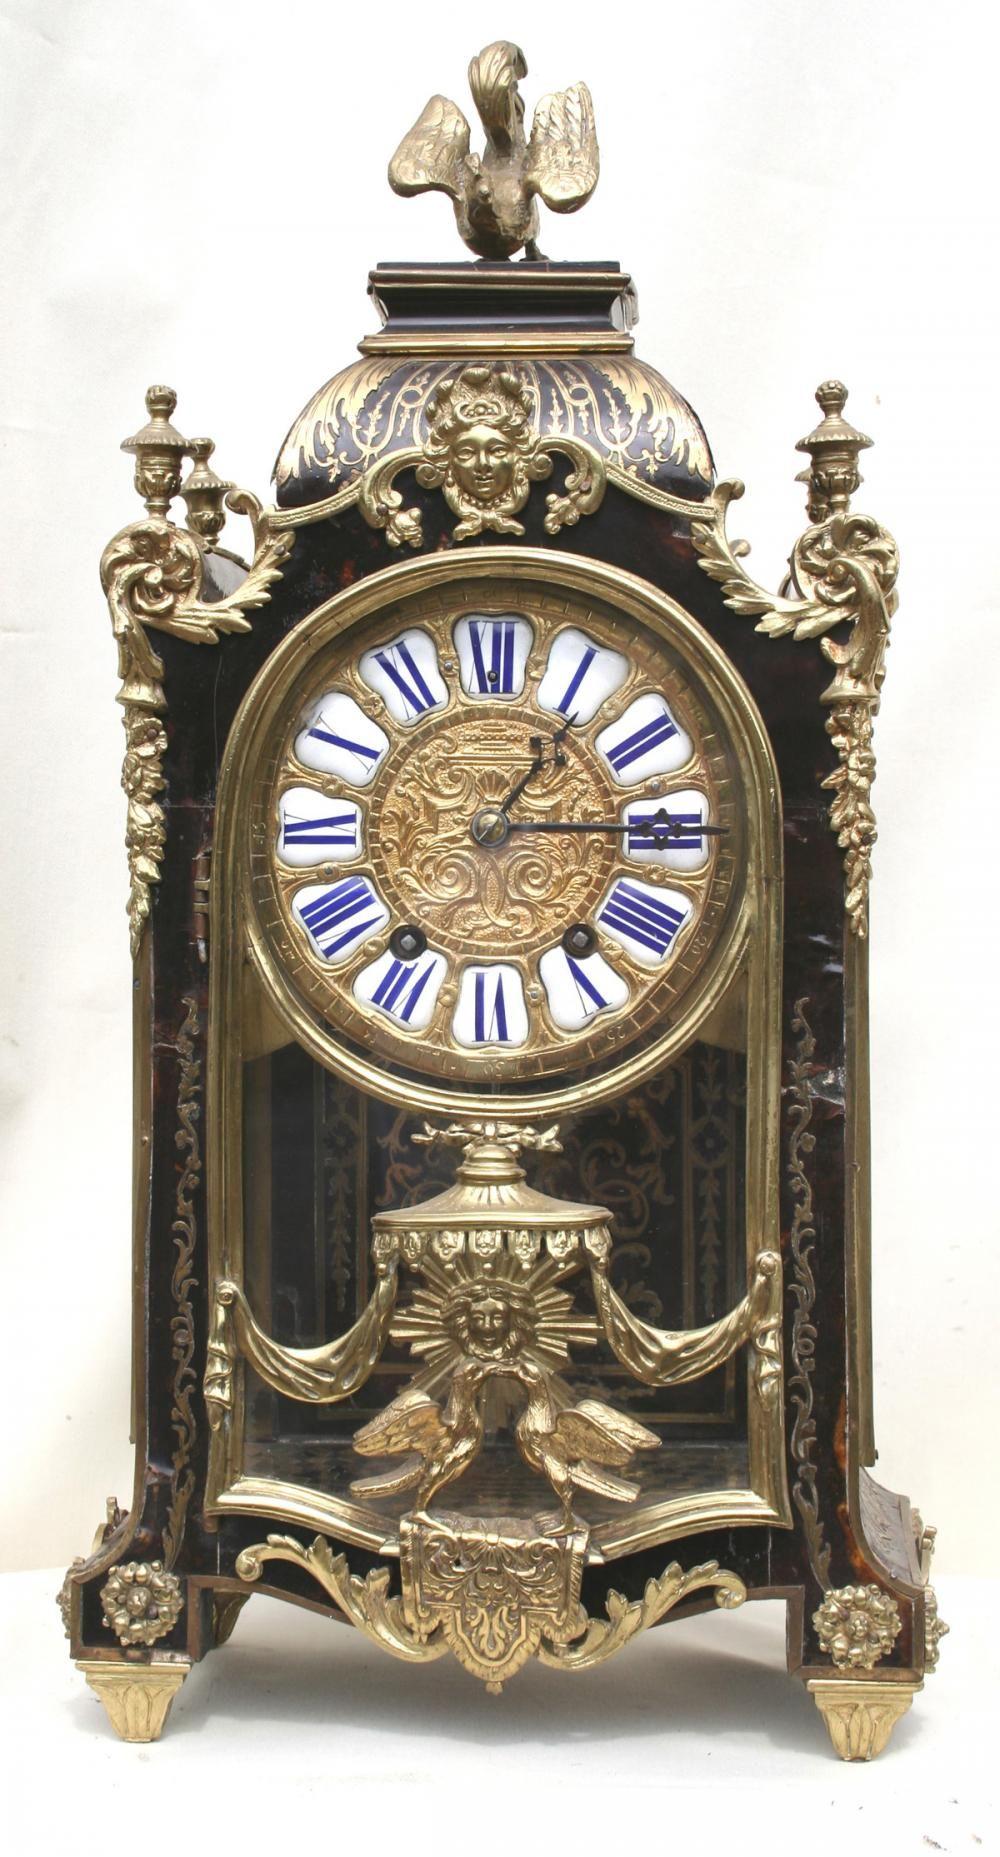 A Small Tortoiseshell Clock Signed Dumoulineuf Paris C 1810